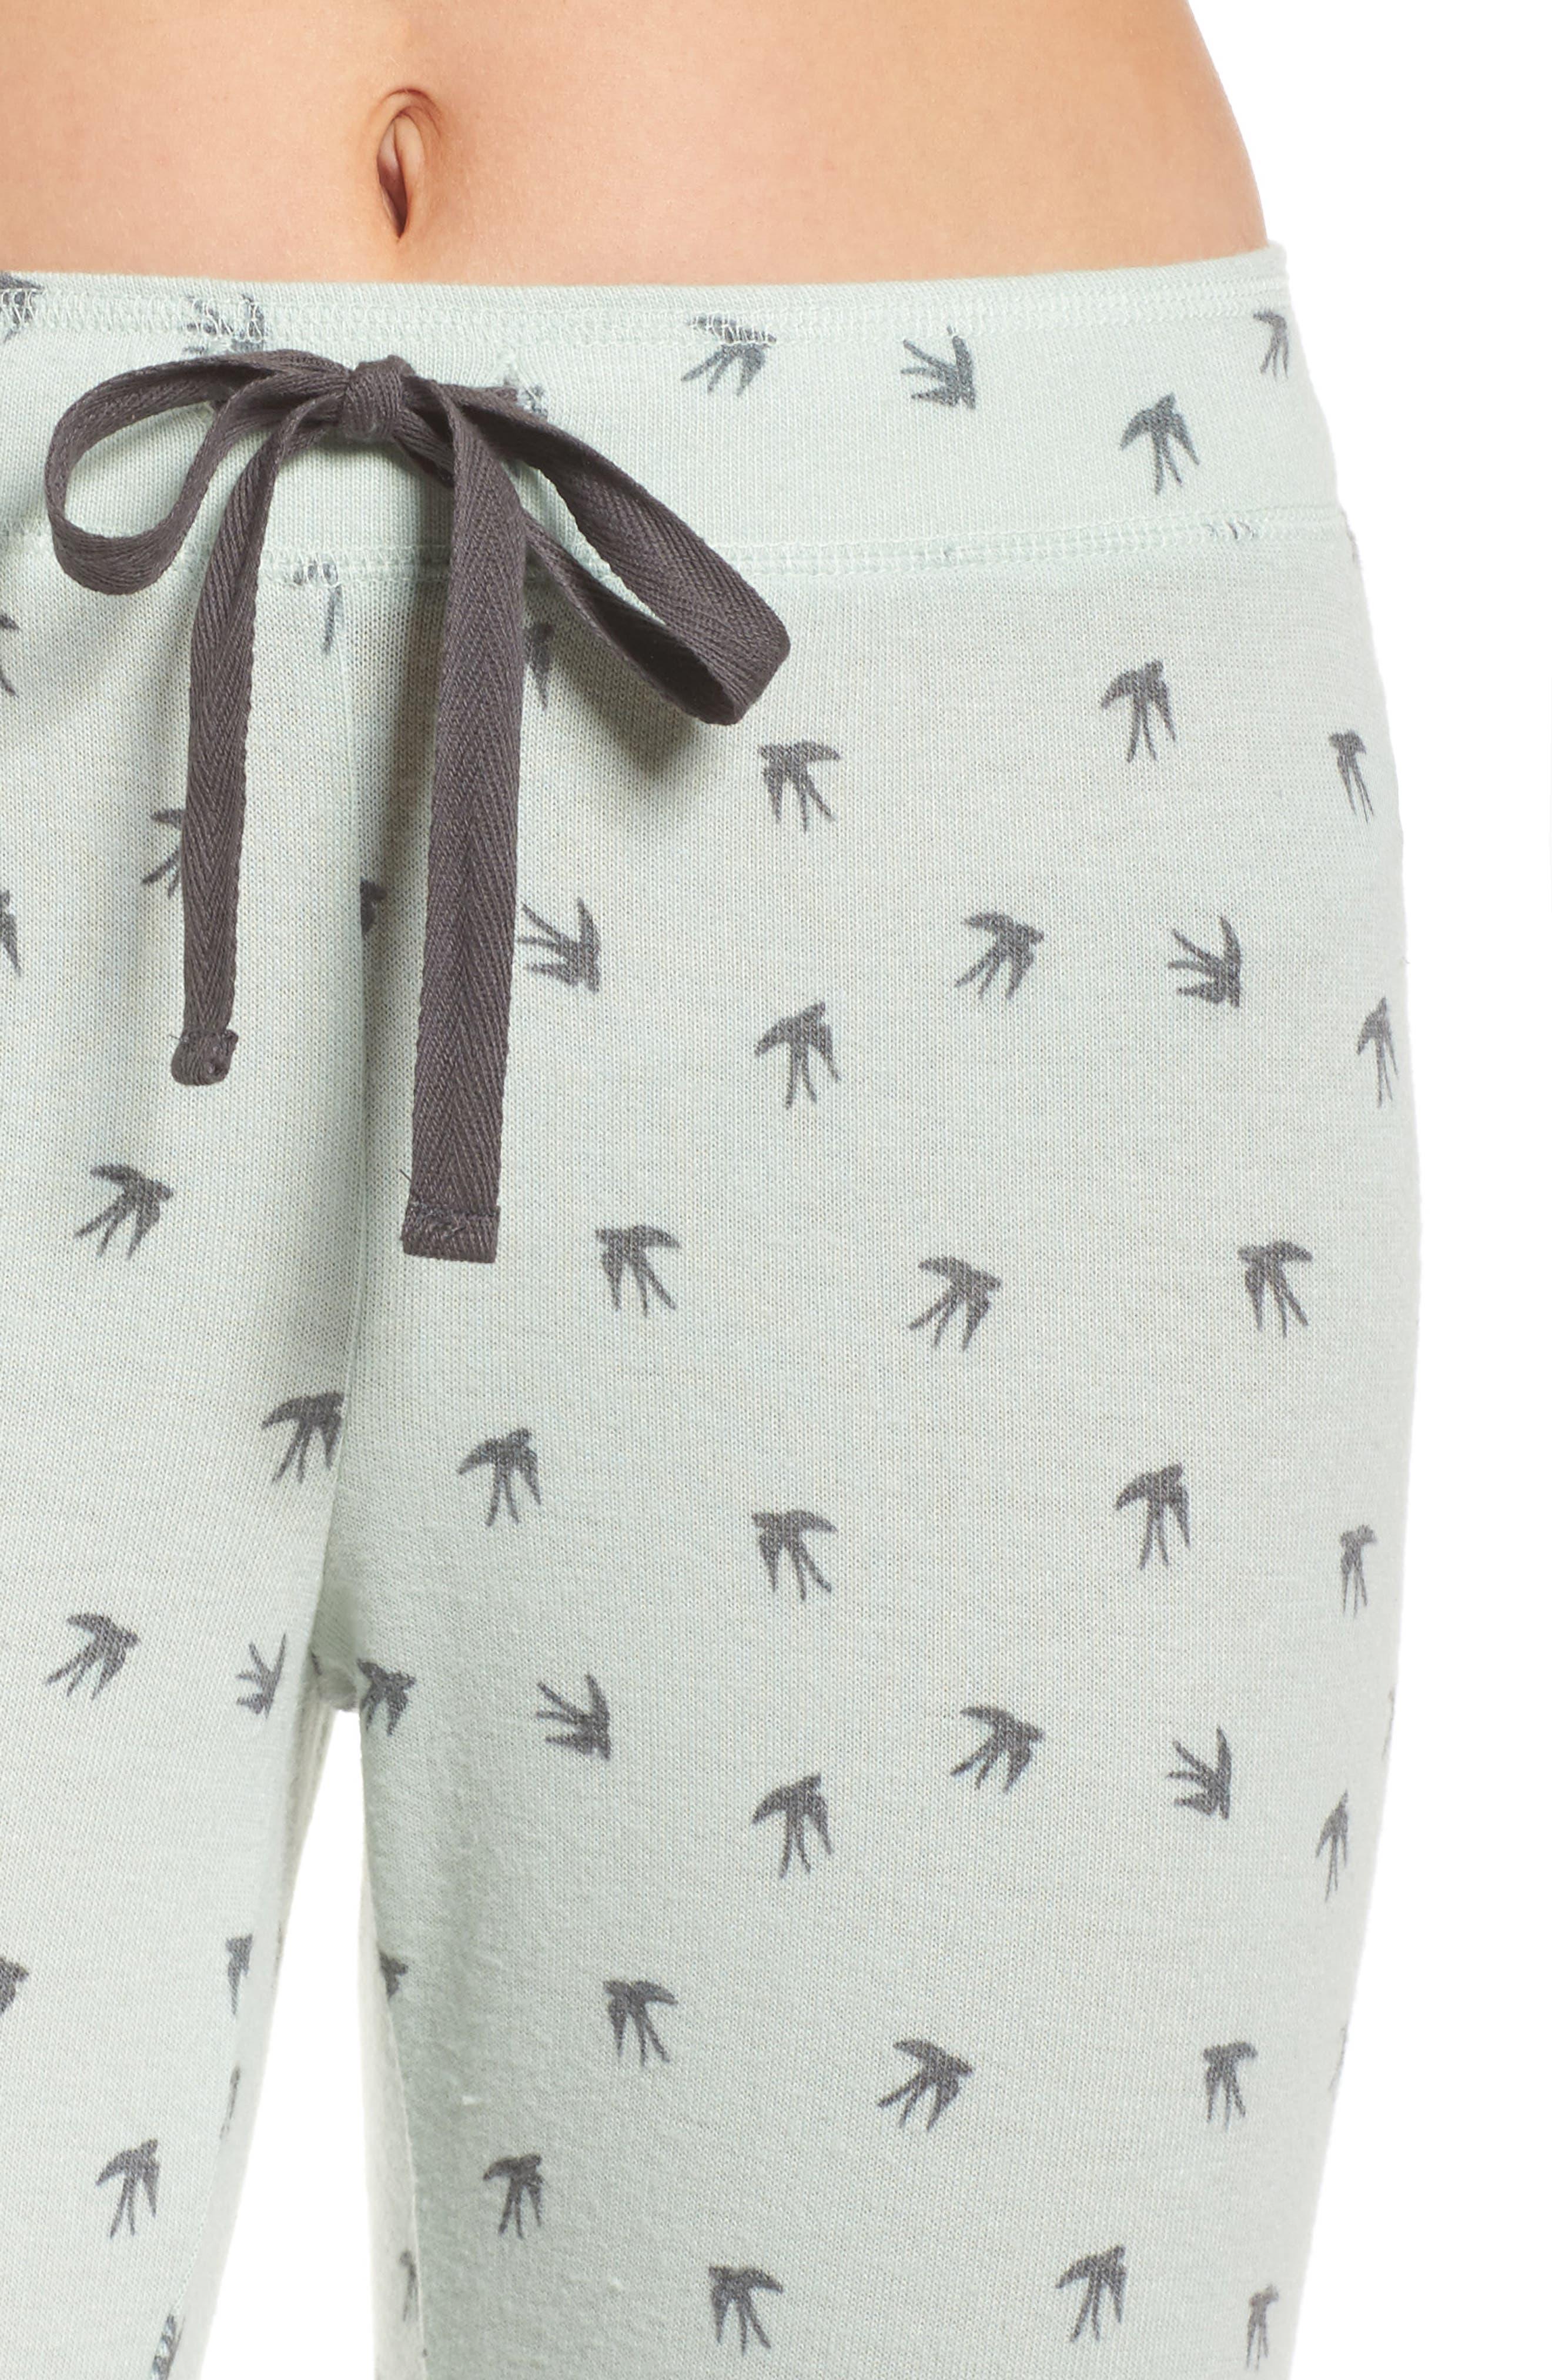 Peachy Pajama Pants,                             Alternate thumbnail 6, color,                             Seafoam